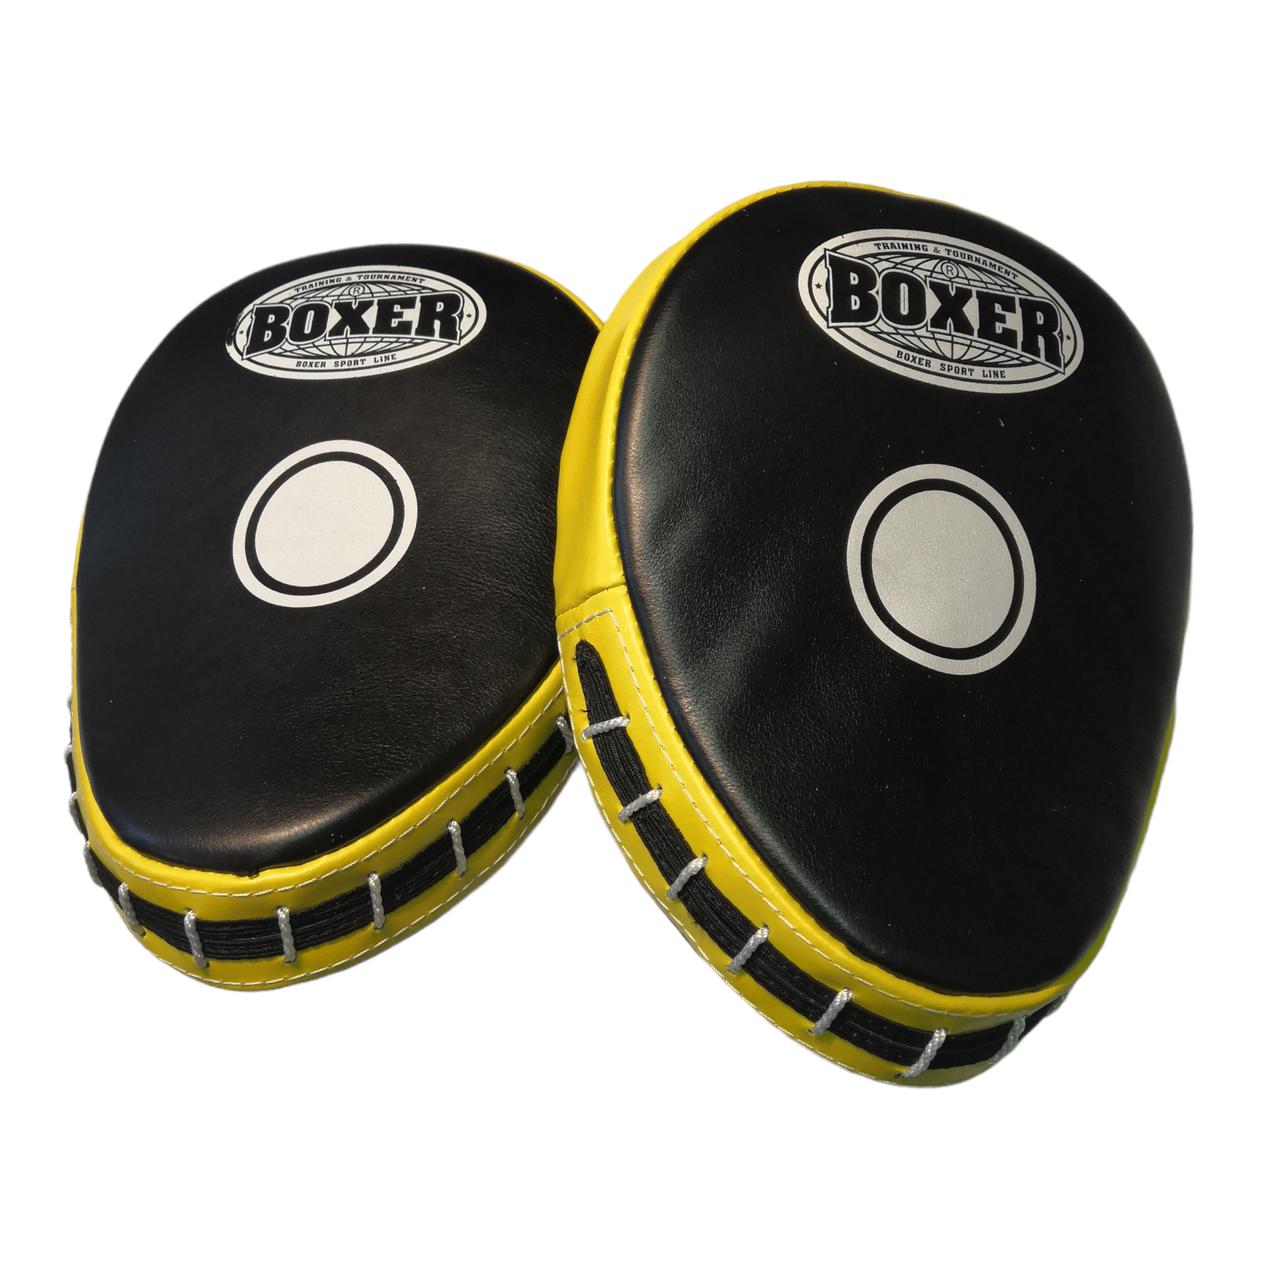 Боксерські лапи гнуті шкіра, жовті BOXER